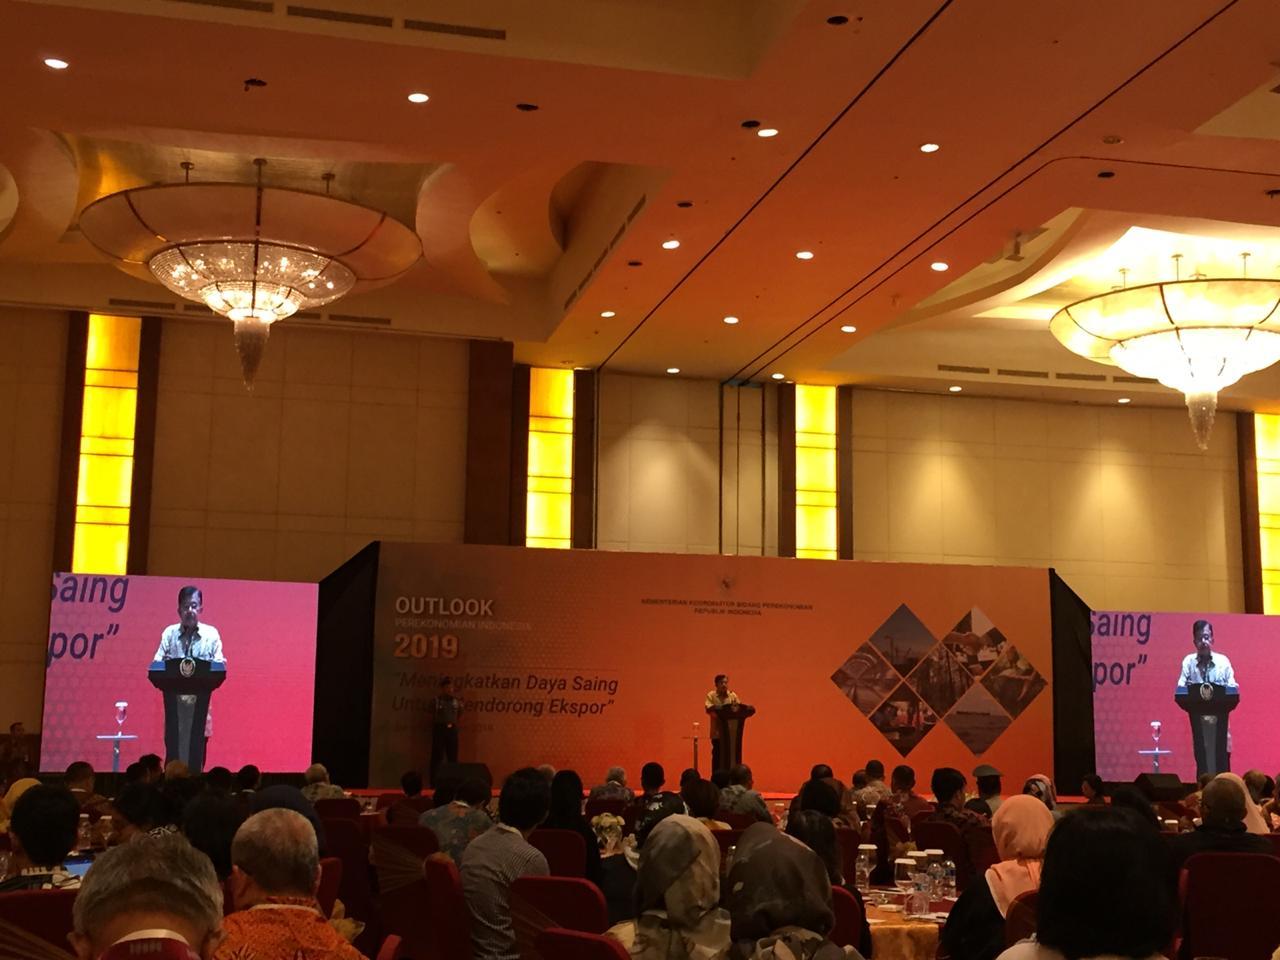 https: img.okezone.com content 2019 01 08 320 2001499 wapres-jk-ingin-indonesia-contoh-china-dalam-meningkatkan-daya-saing-LTdc8QsJKz.jpeg